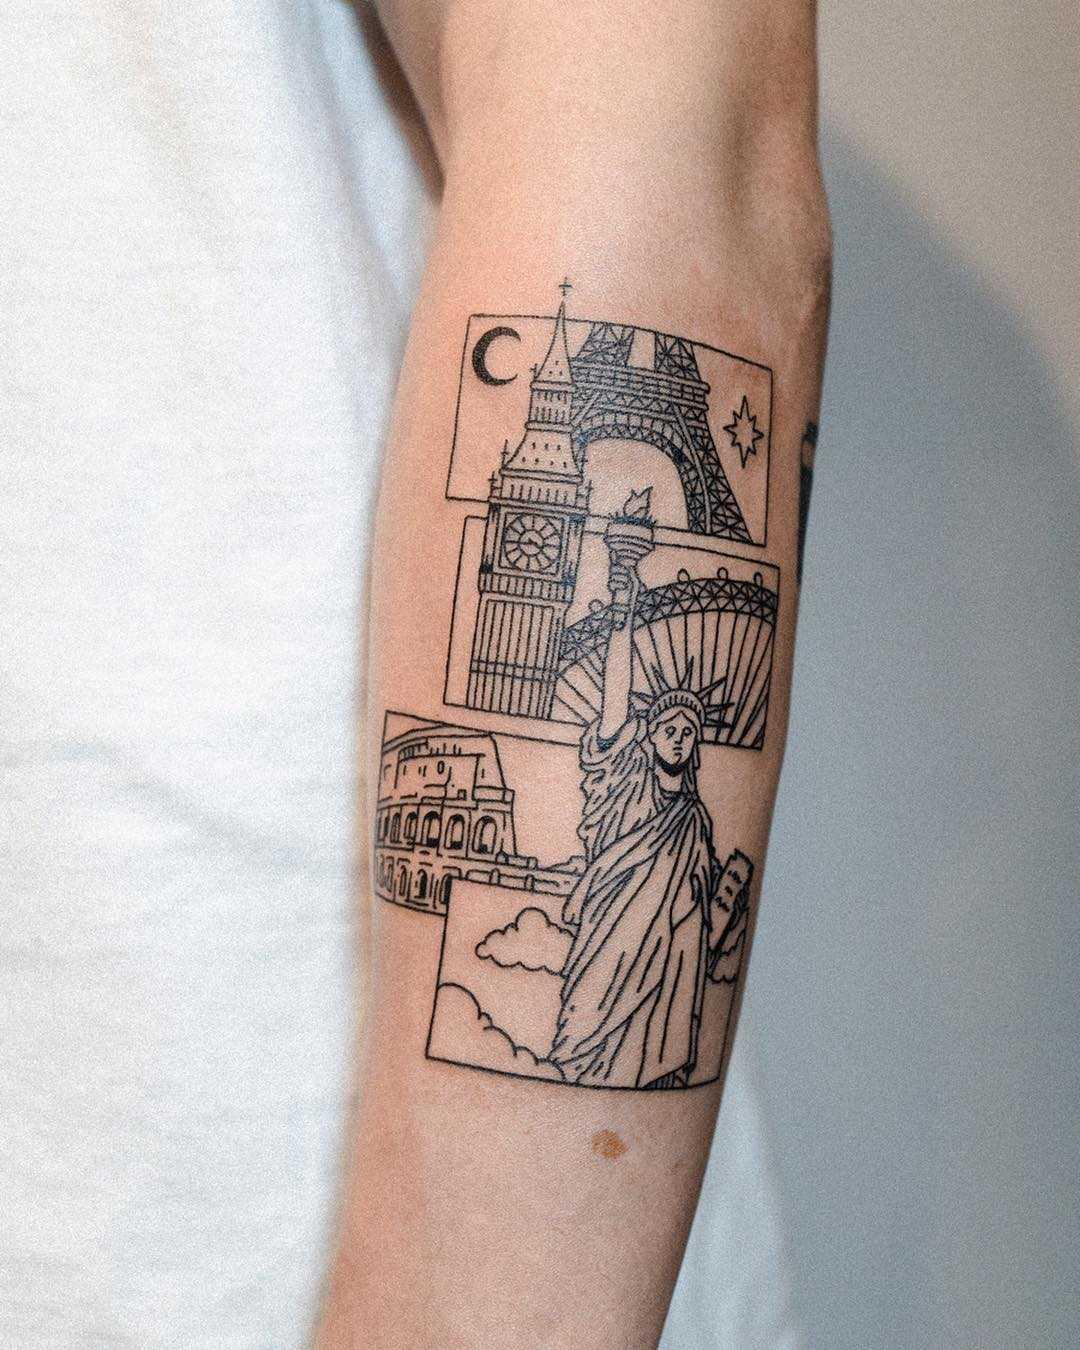 Landmark tattoo by tattooist Bongkee